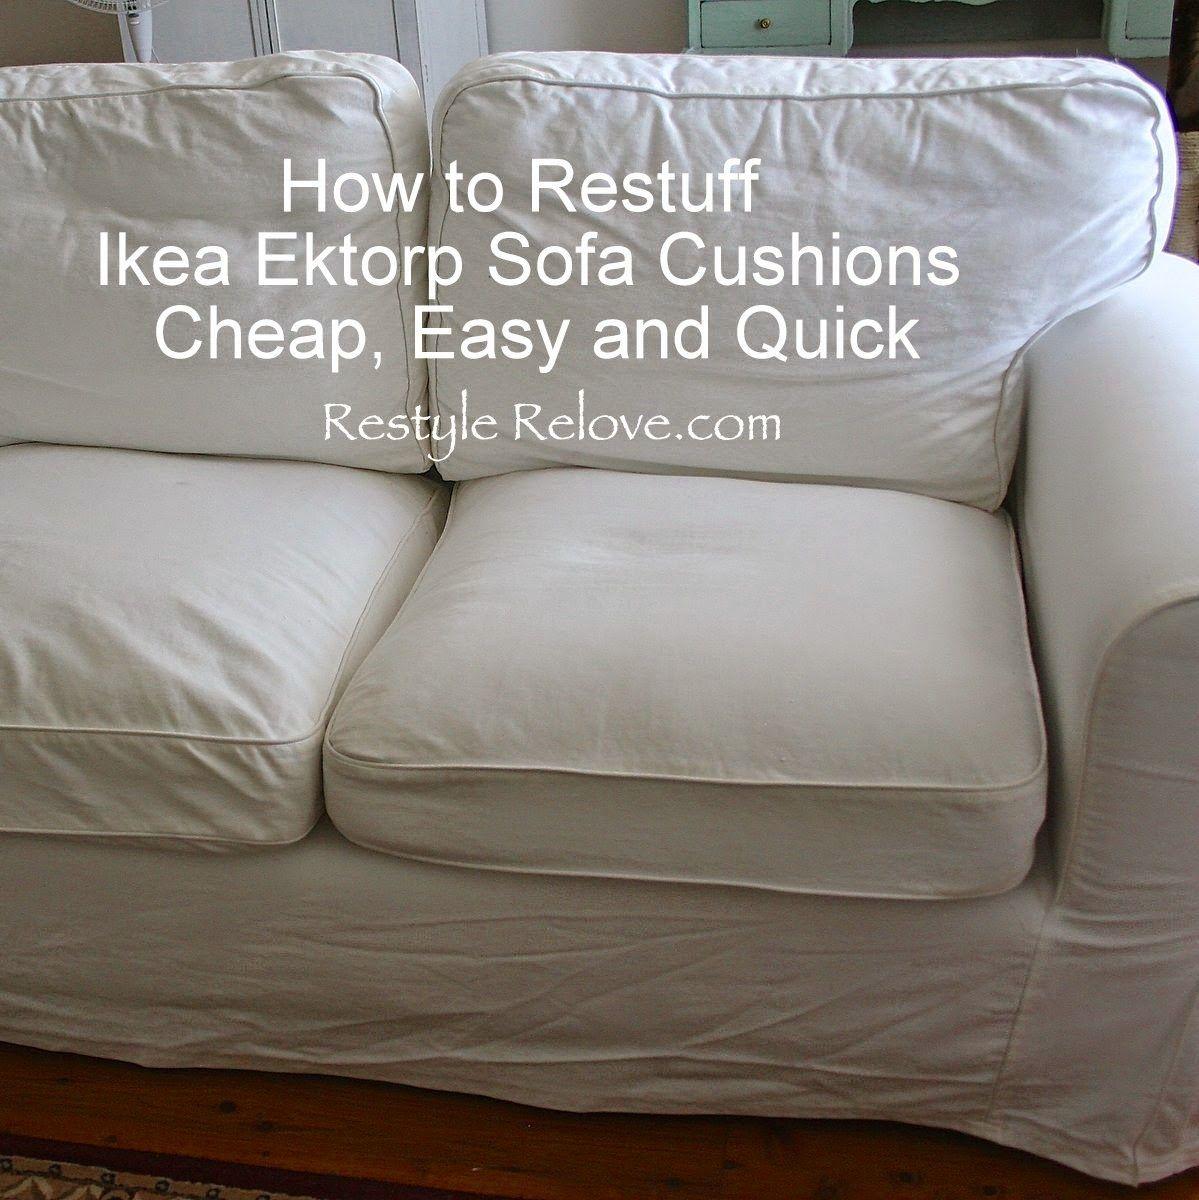 Restuff Ikea Rp Sofa Cushions